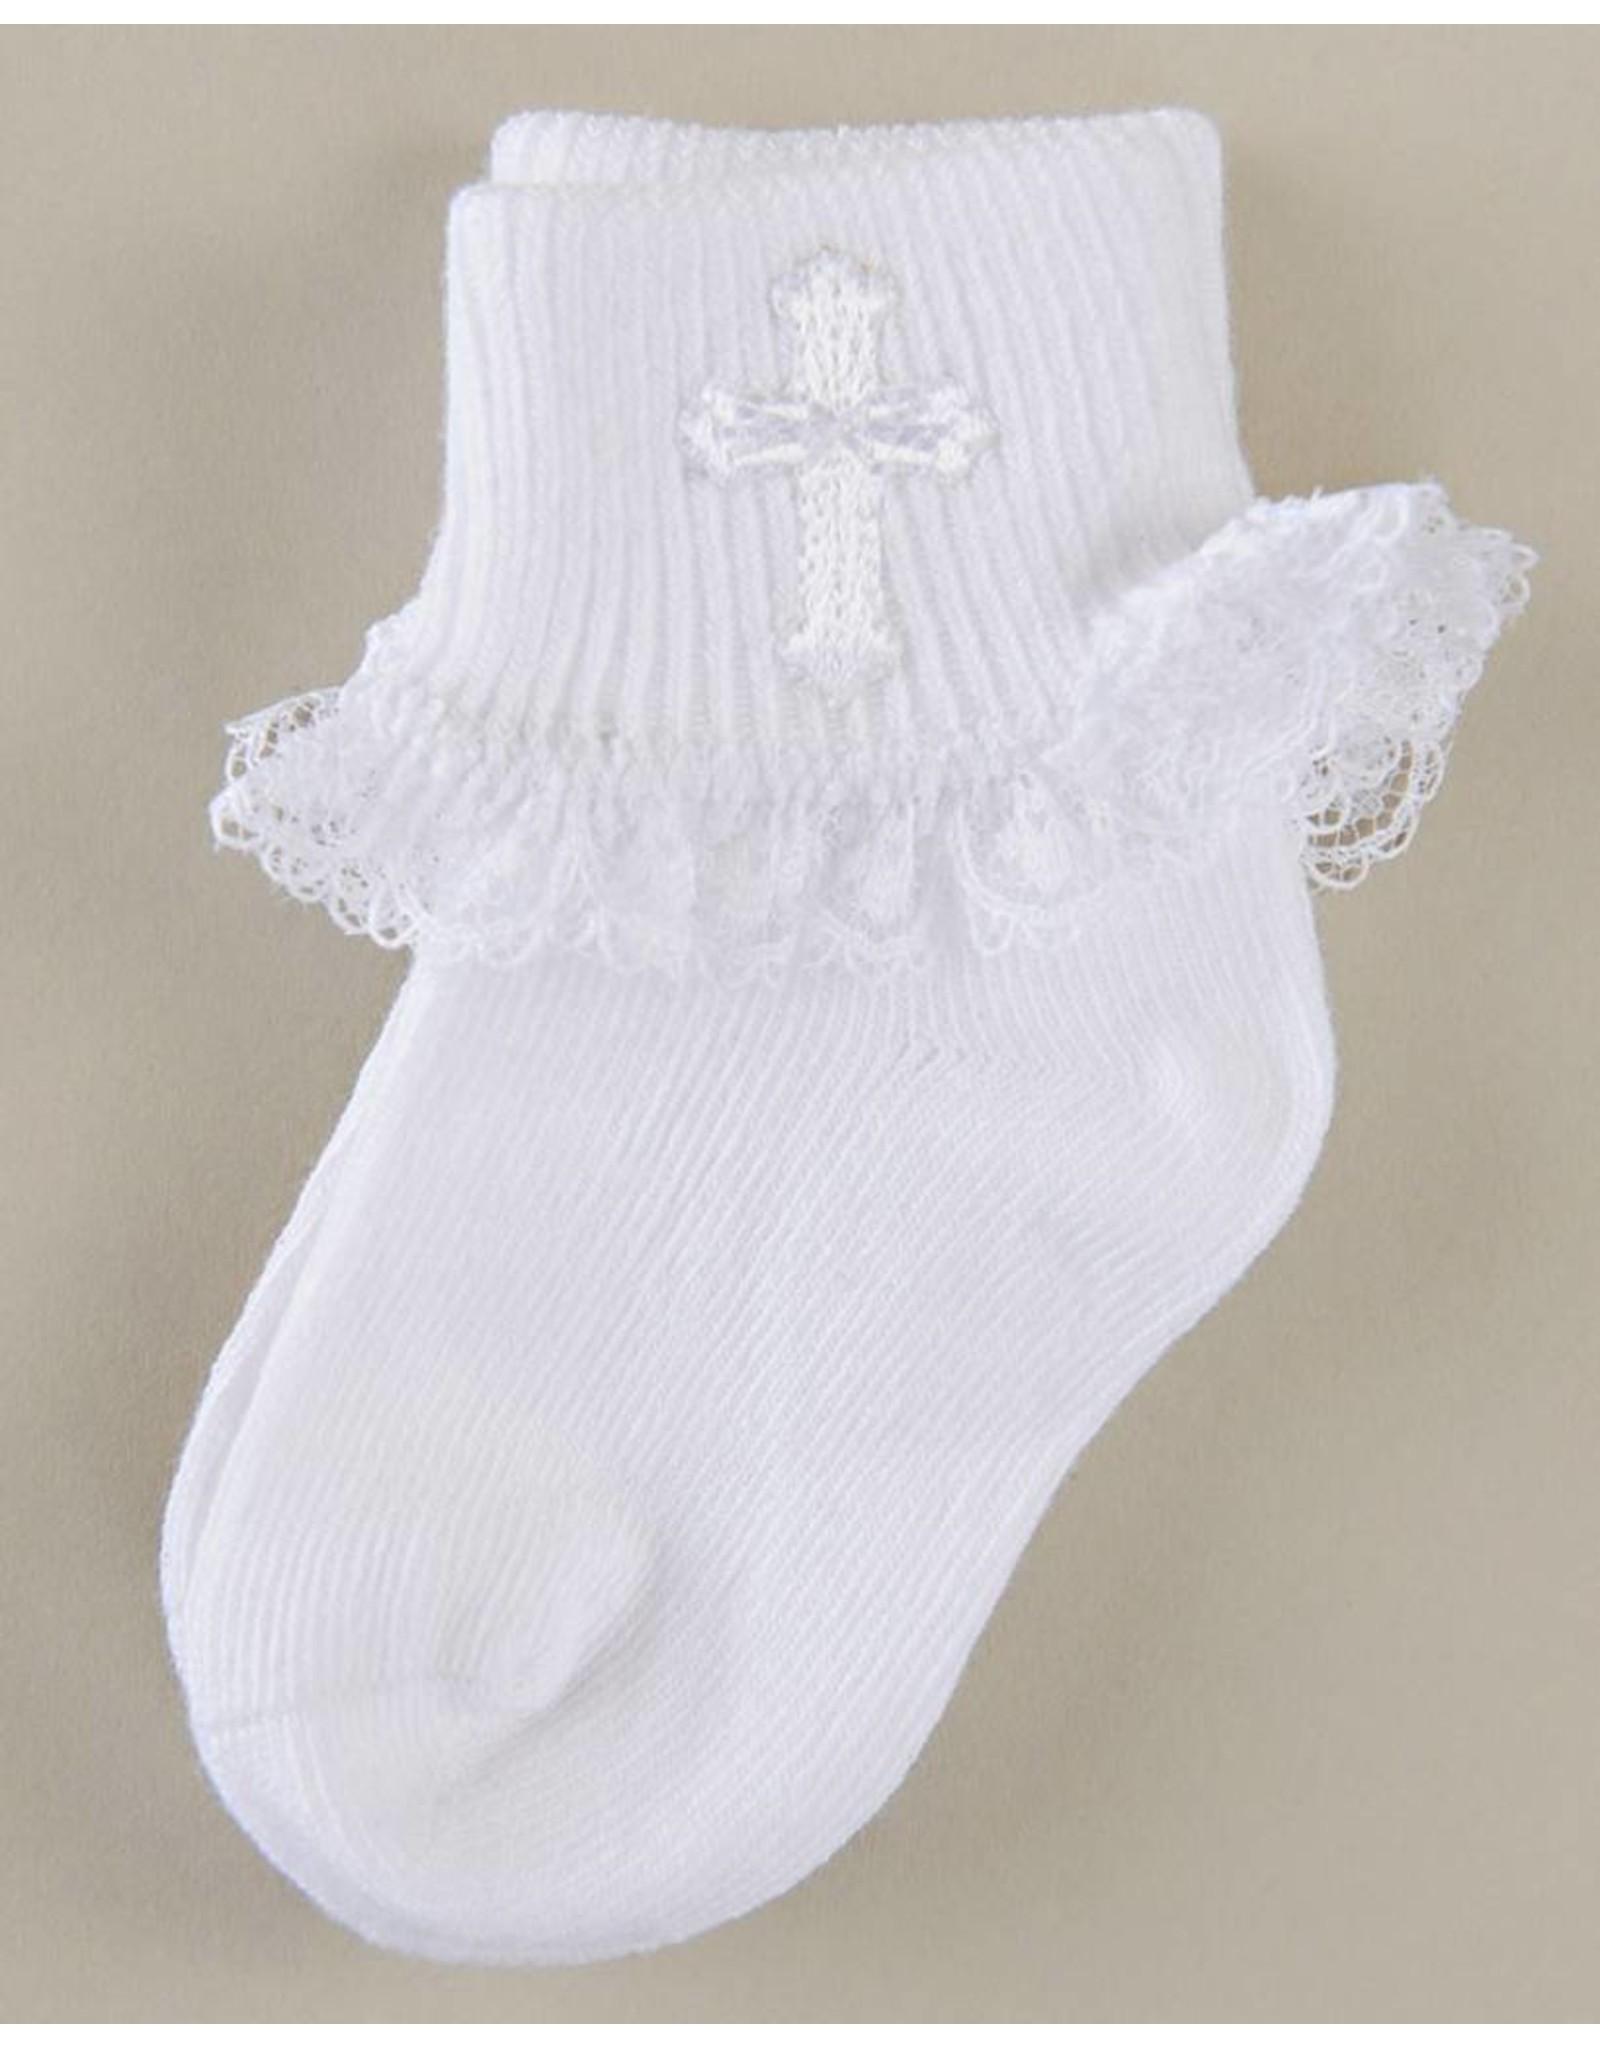 CBE, Inc. White Lace Socks with Cross